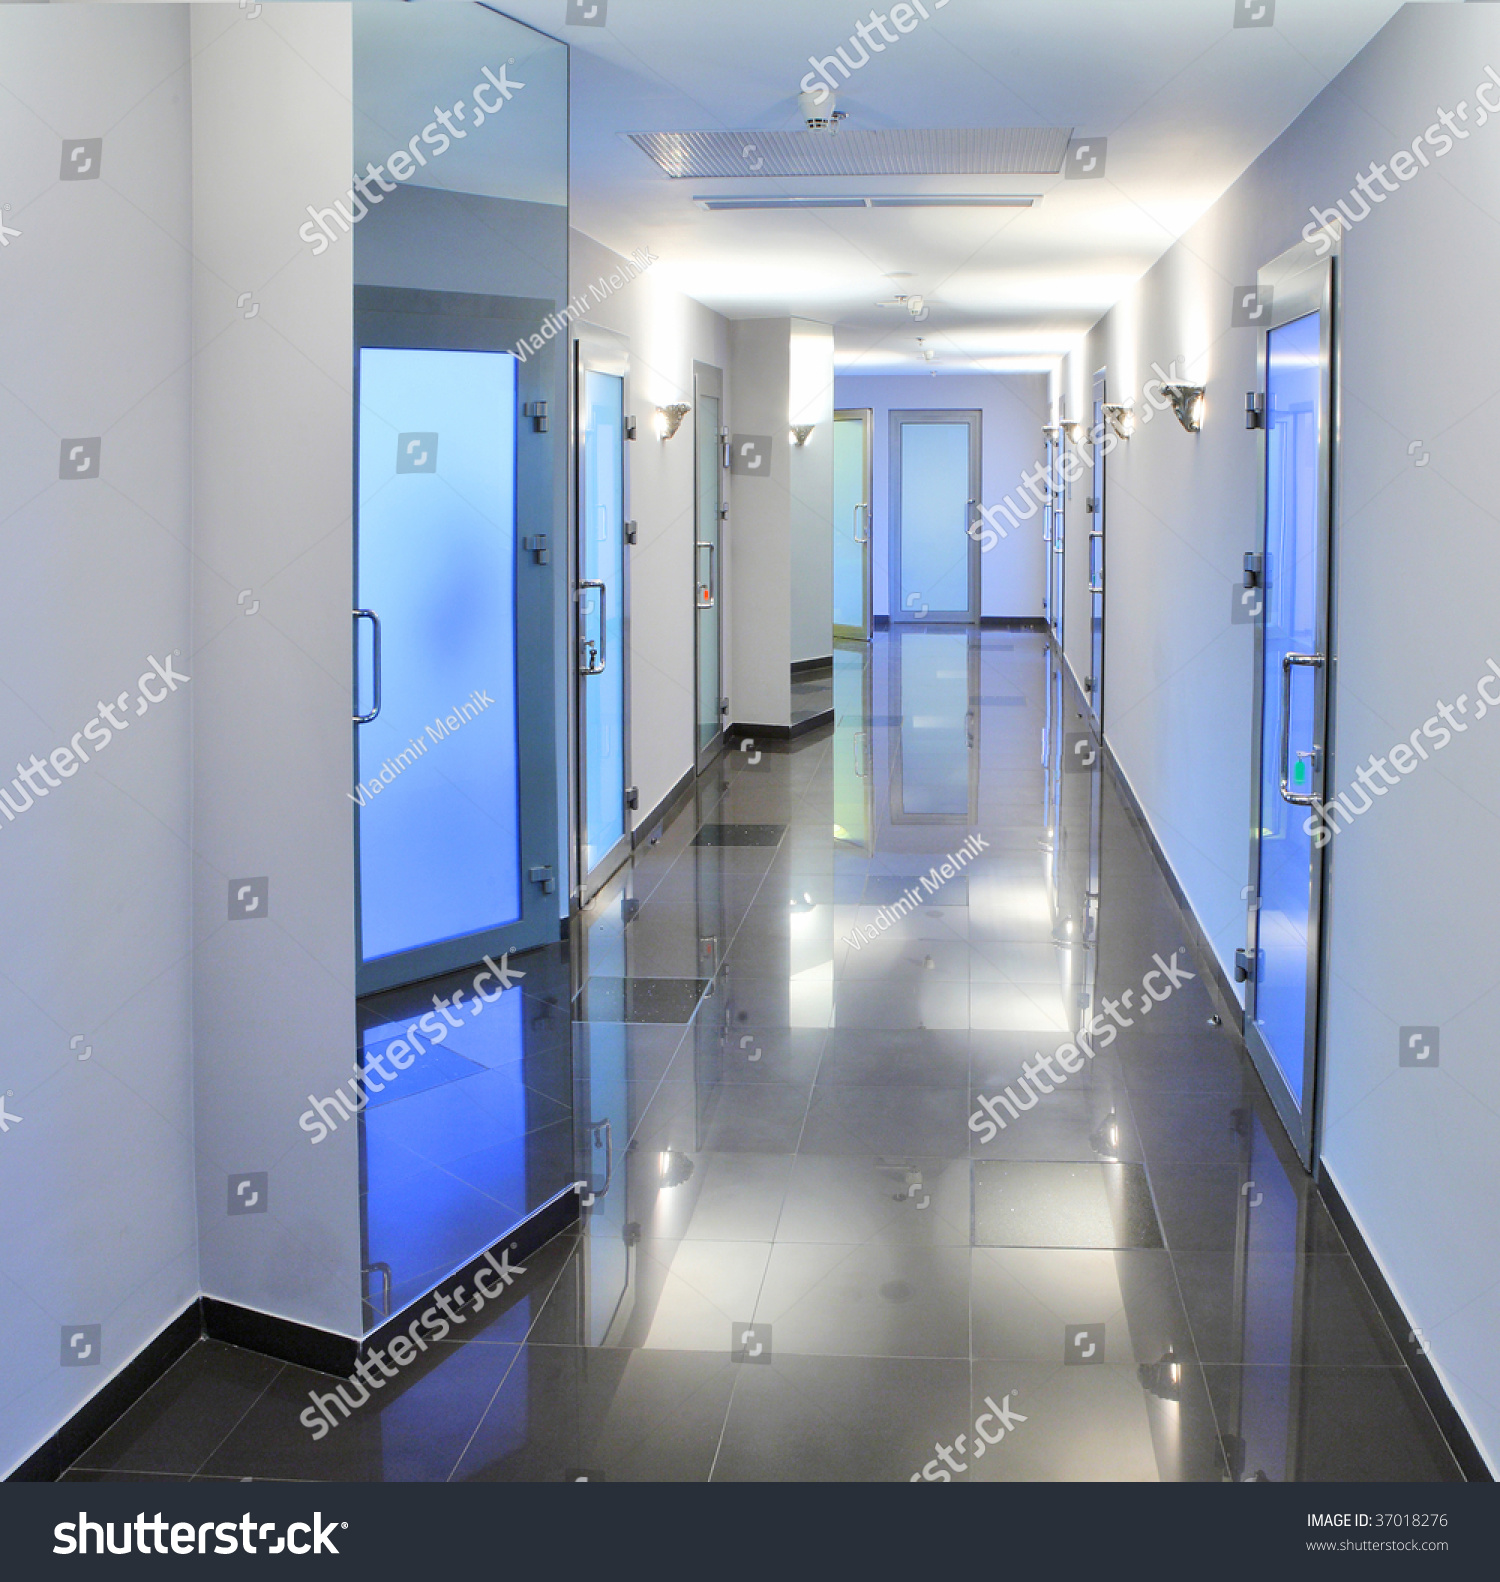 Hospital Corridor Lighting Design: Long, Empty Corridor In A Hospital Or Office Building